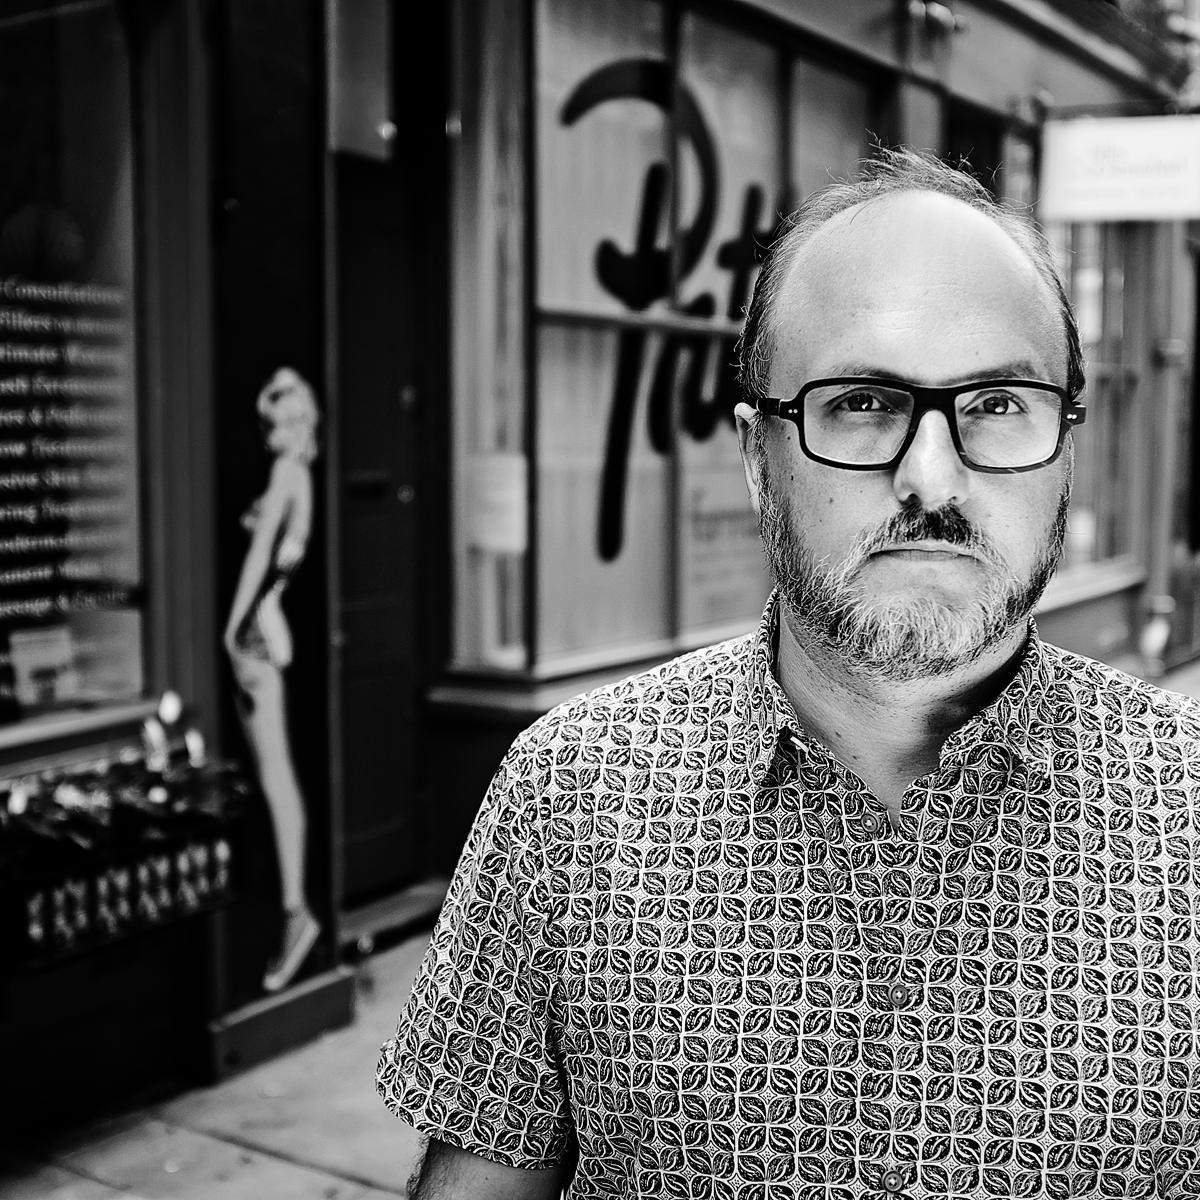 Portrait of Joakim Borgstrom, Executive Director at BBH London by Julian Hanford